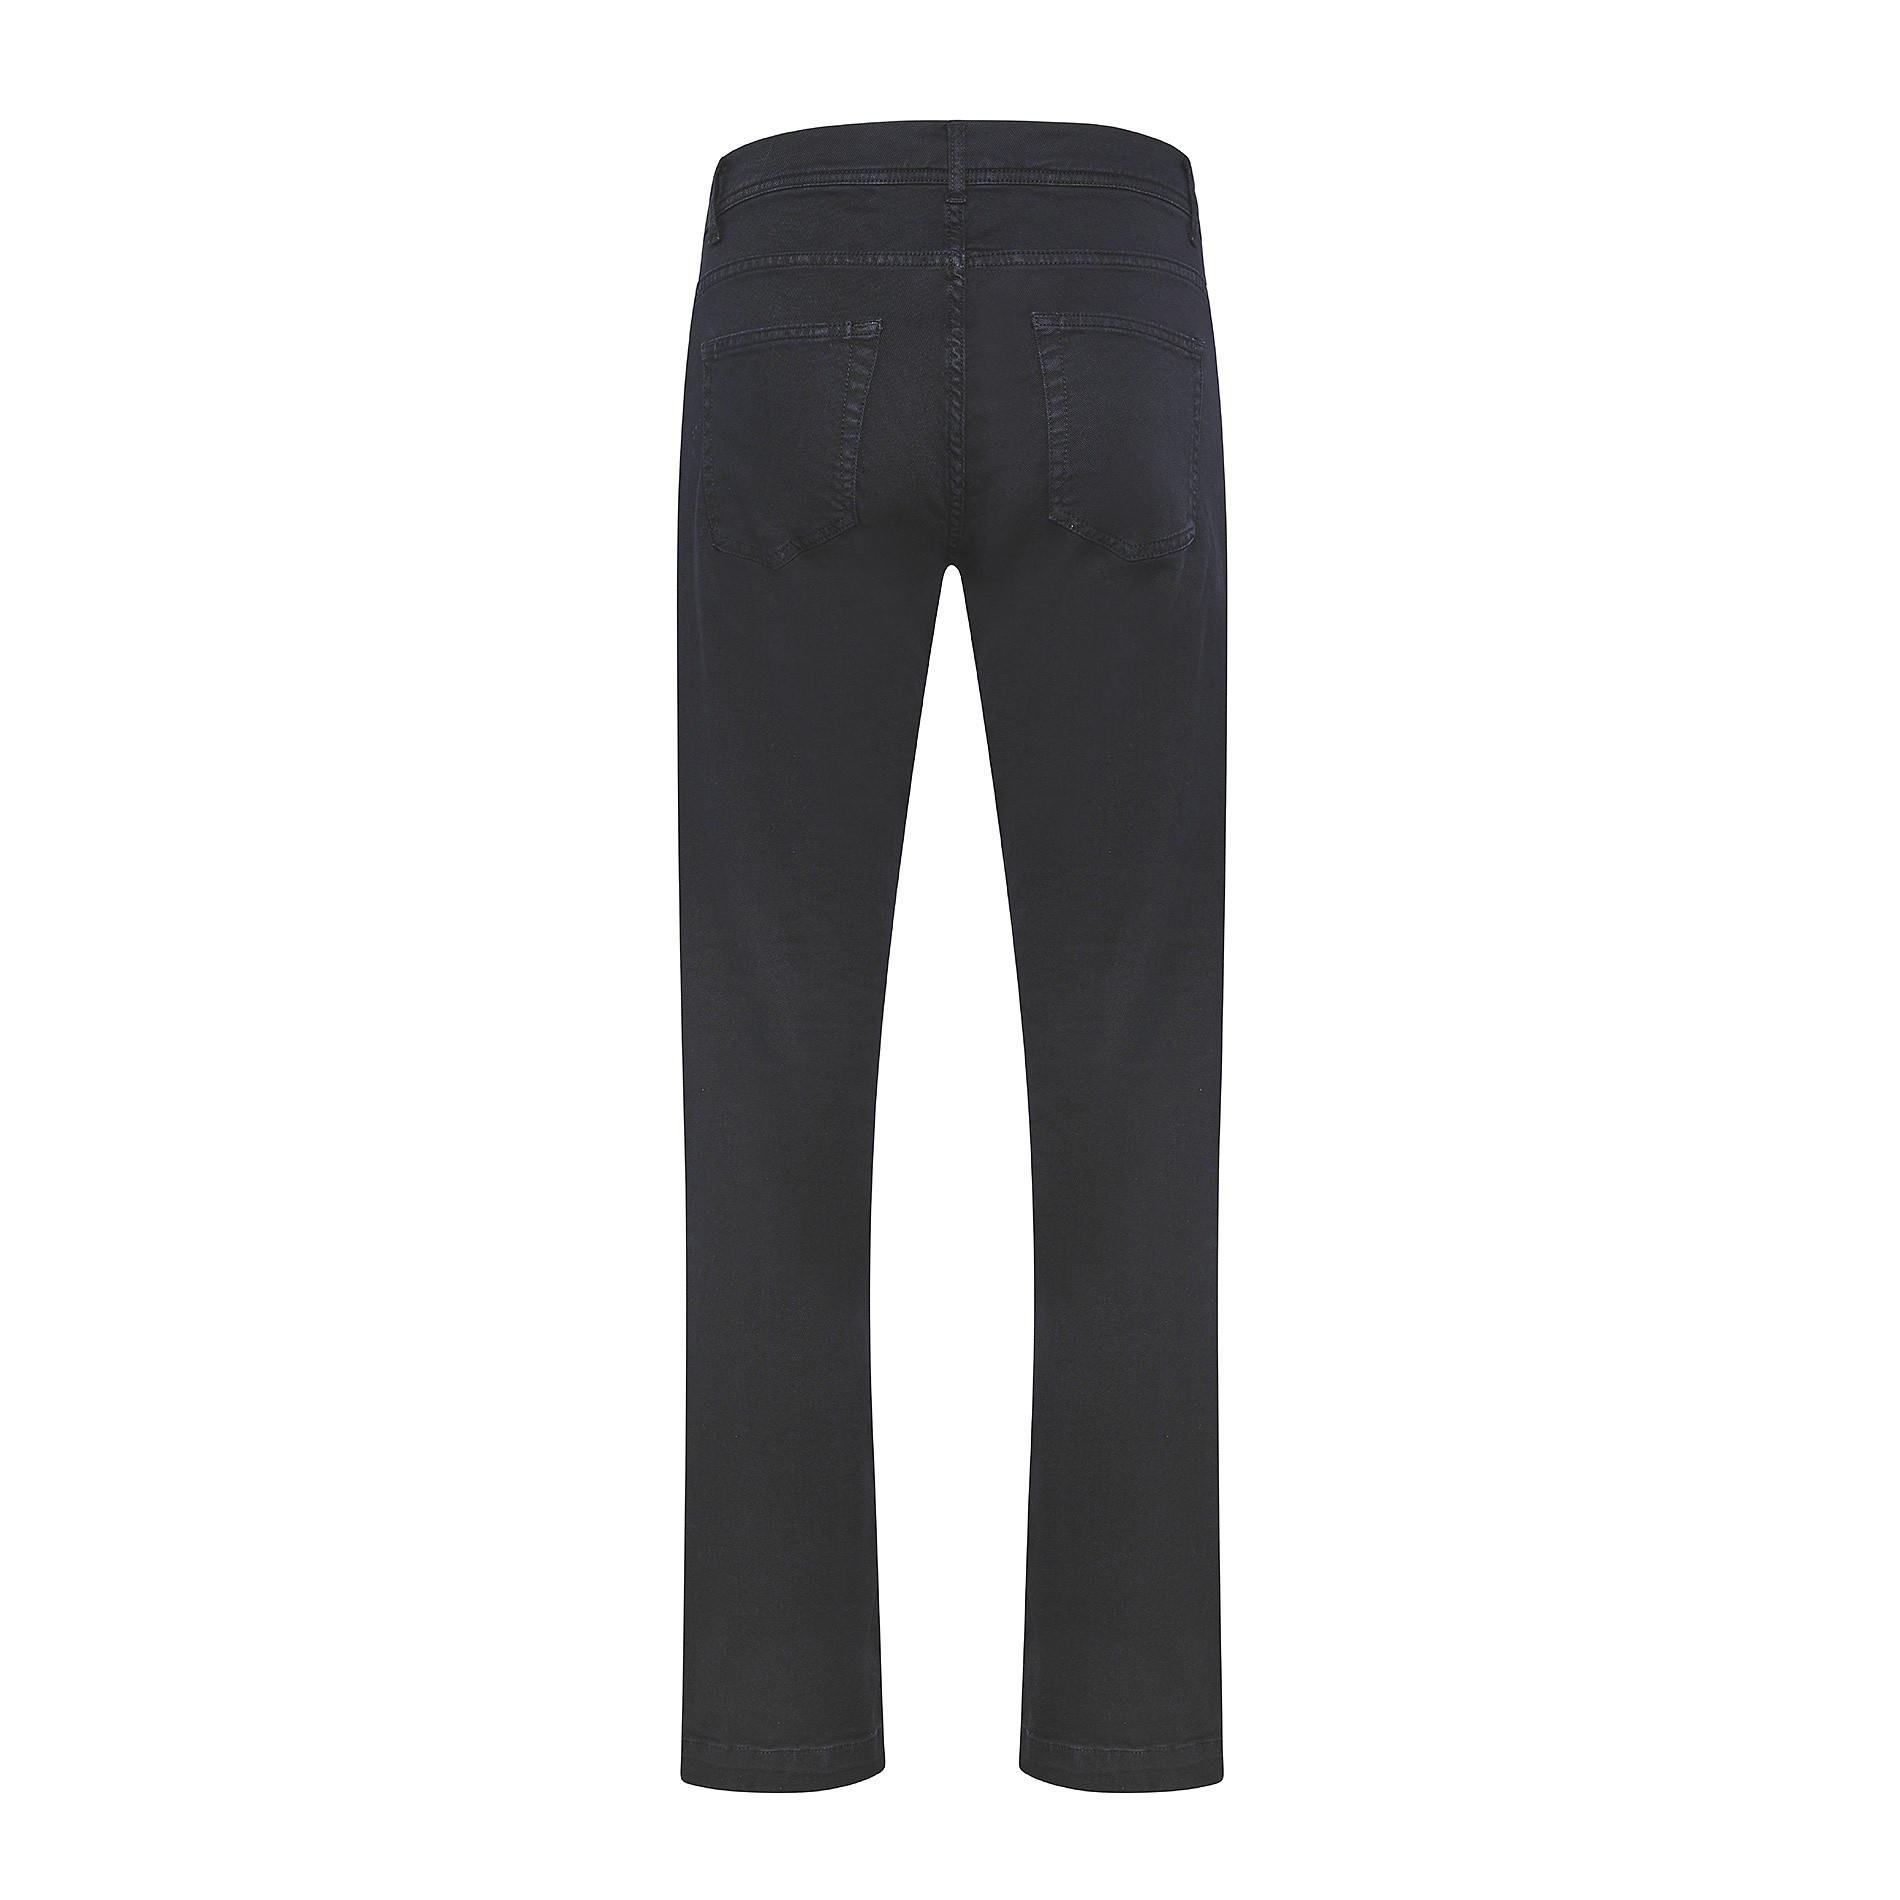 Pantalone cotone stretch 5 tasche JCT, Blu scuro, large image number 1